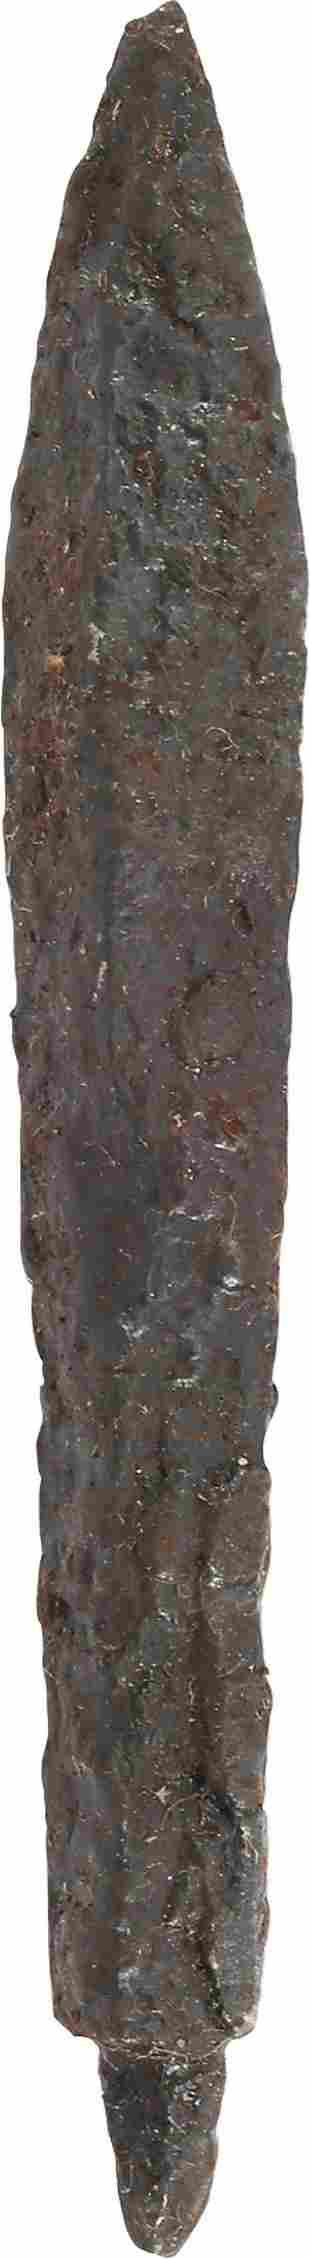 GERMAN CROSSBOW BOLT EARLY 14th CENTURY